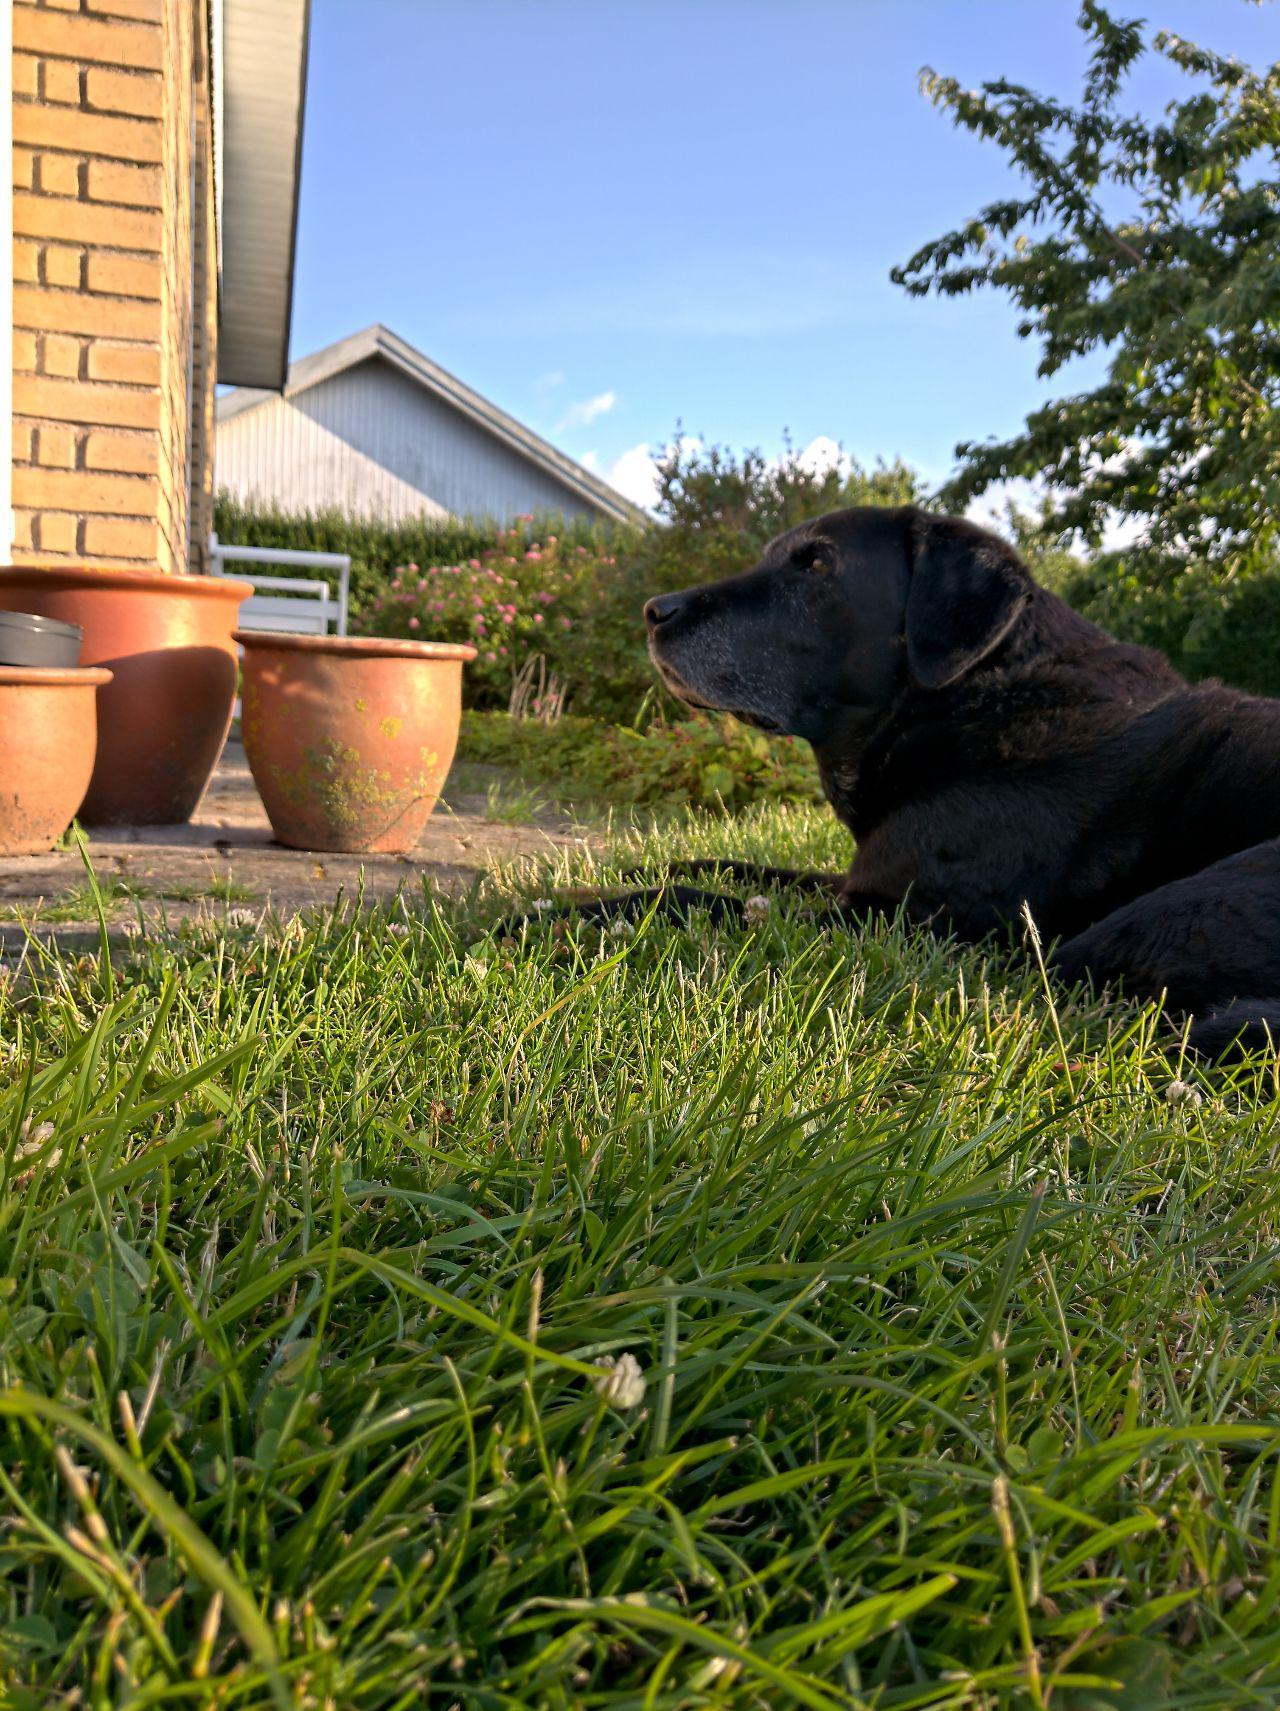 Dog enjoying nature on the grass